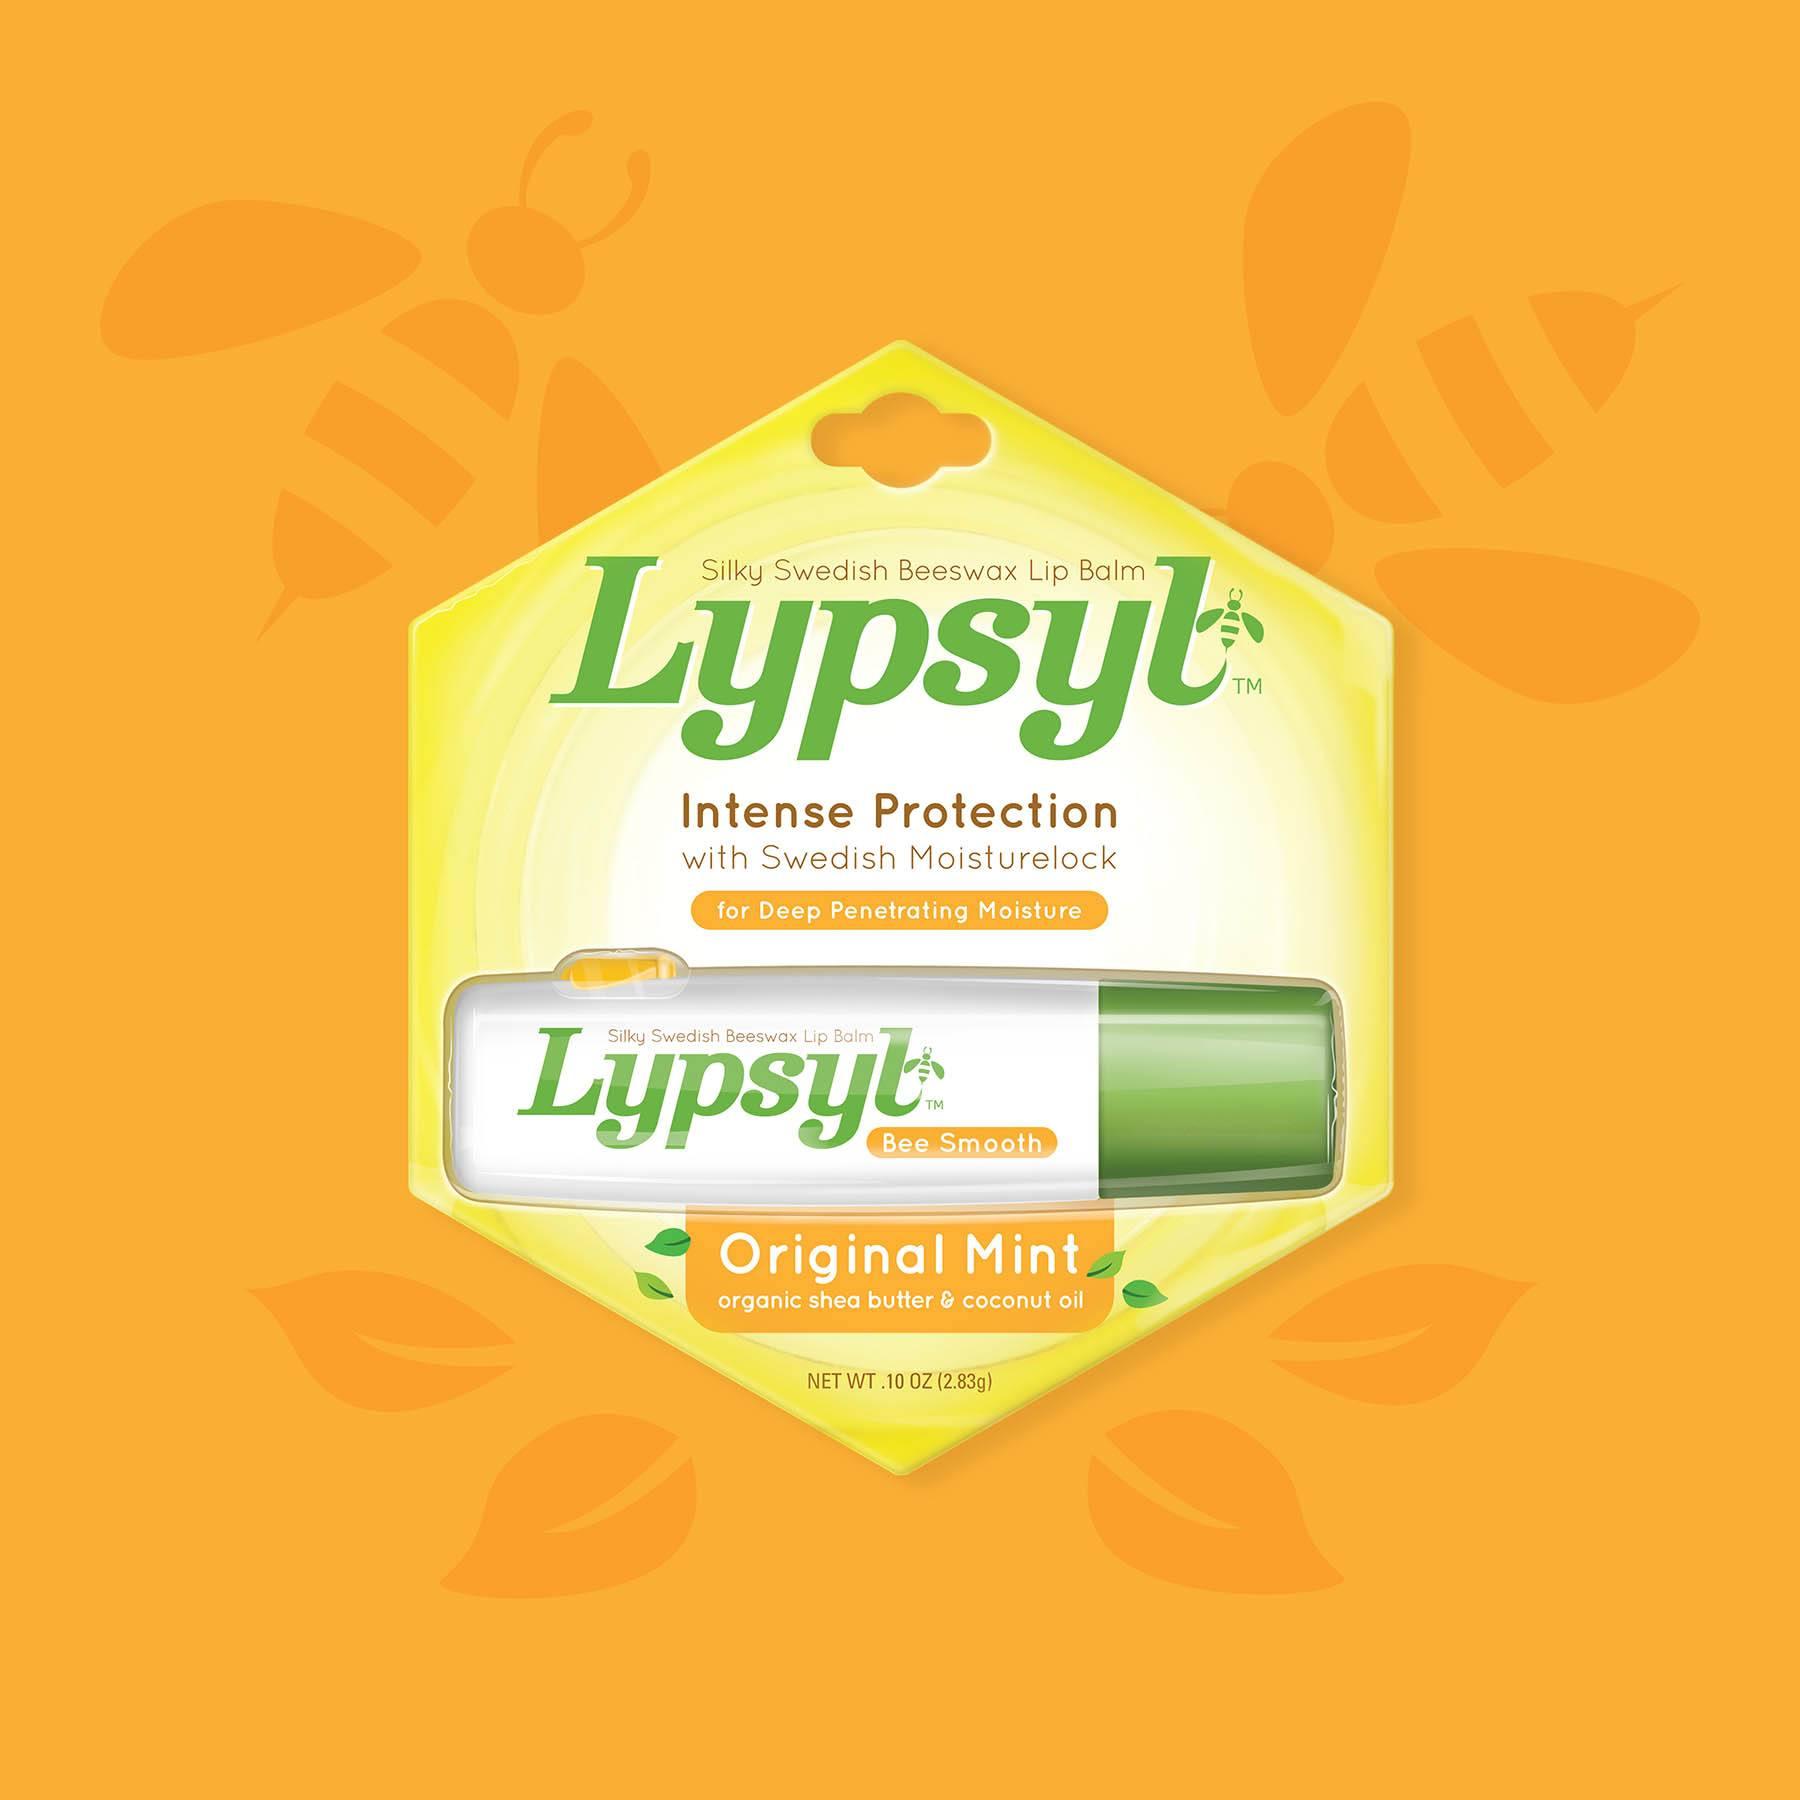 Lypsyl Lip Balm Mint Package Design